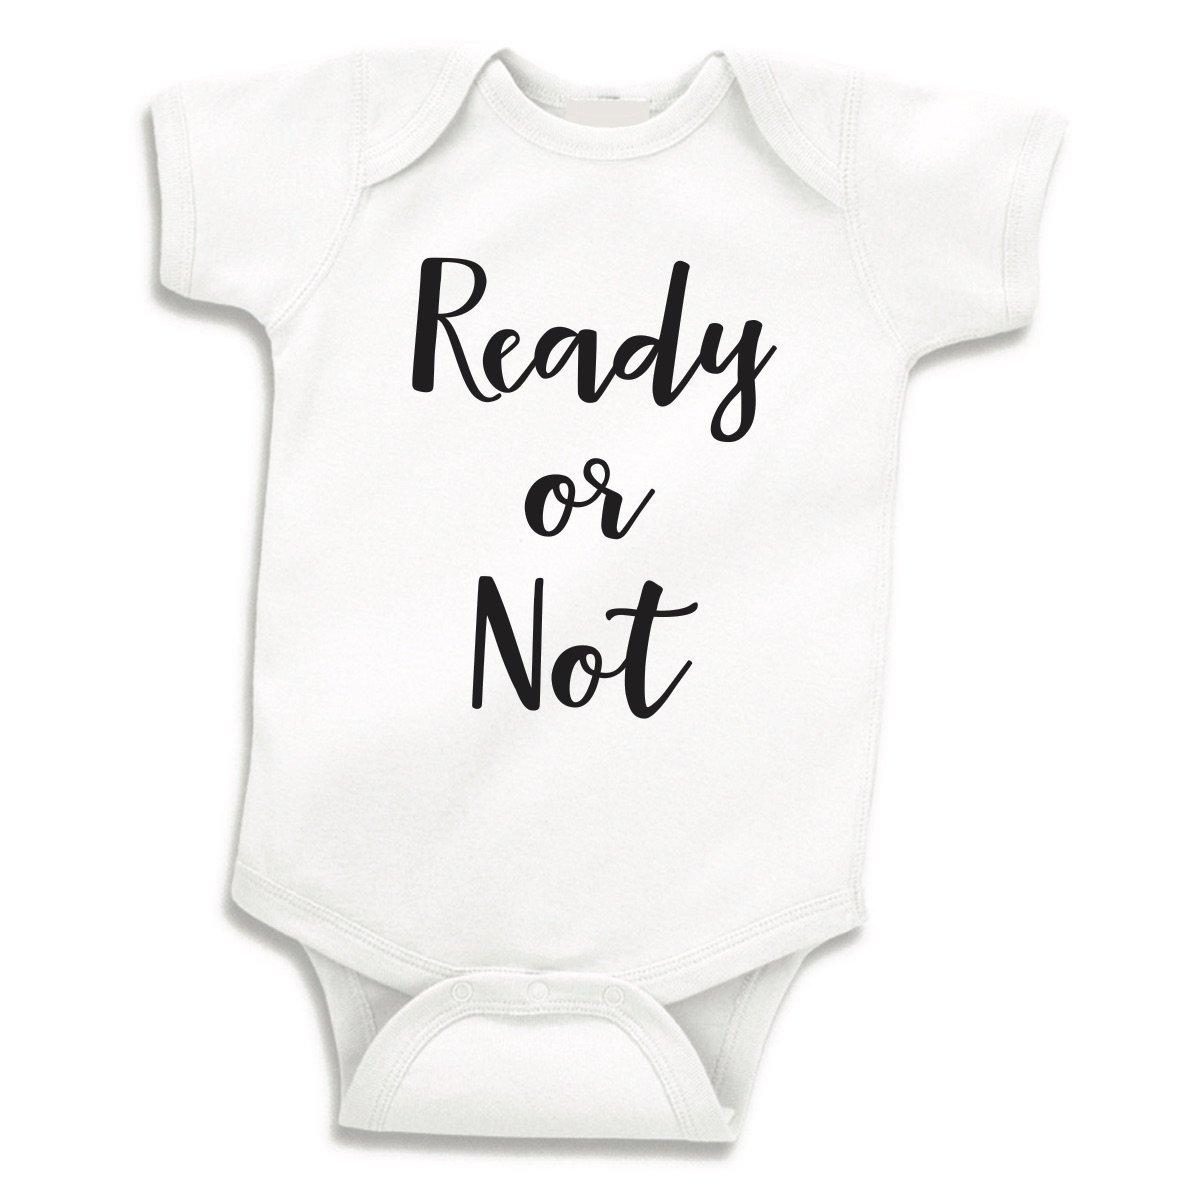 Ready or Not Pregnancy Announcement Bodysuit Newborn Baby Shower Gift (0-3 Months)